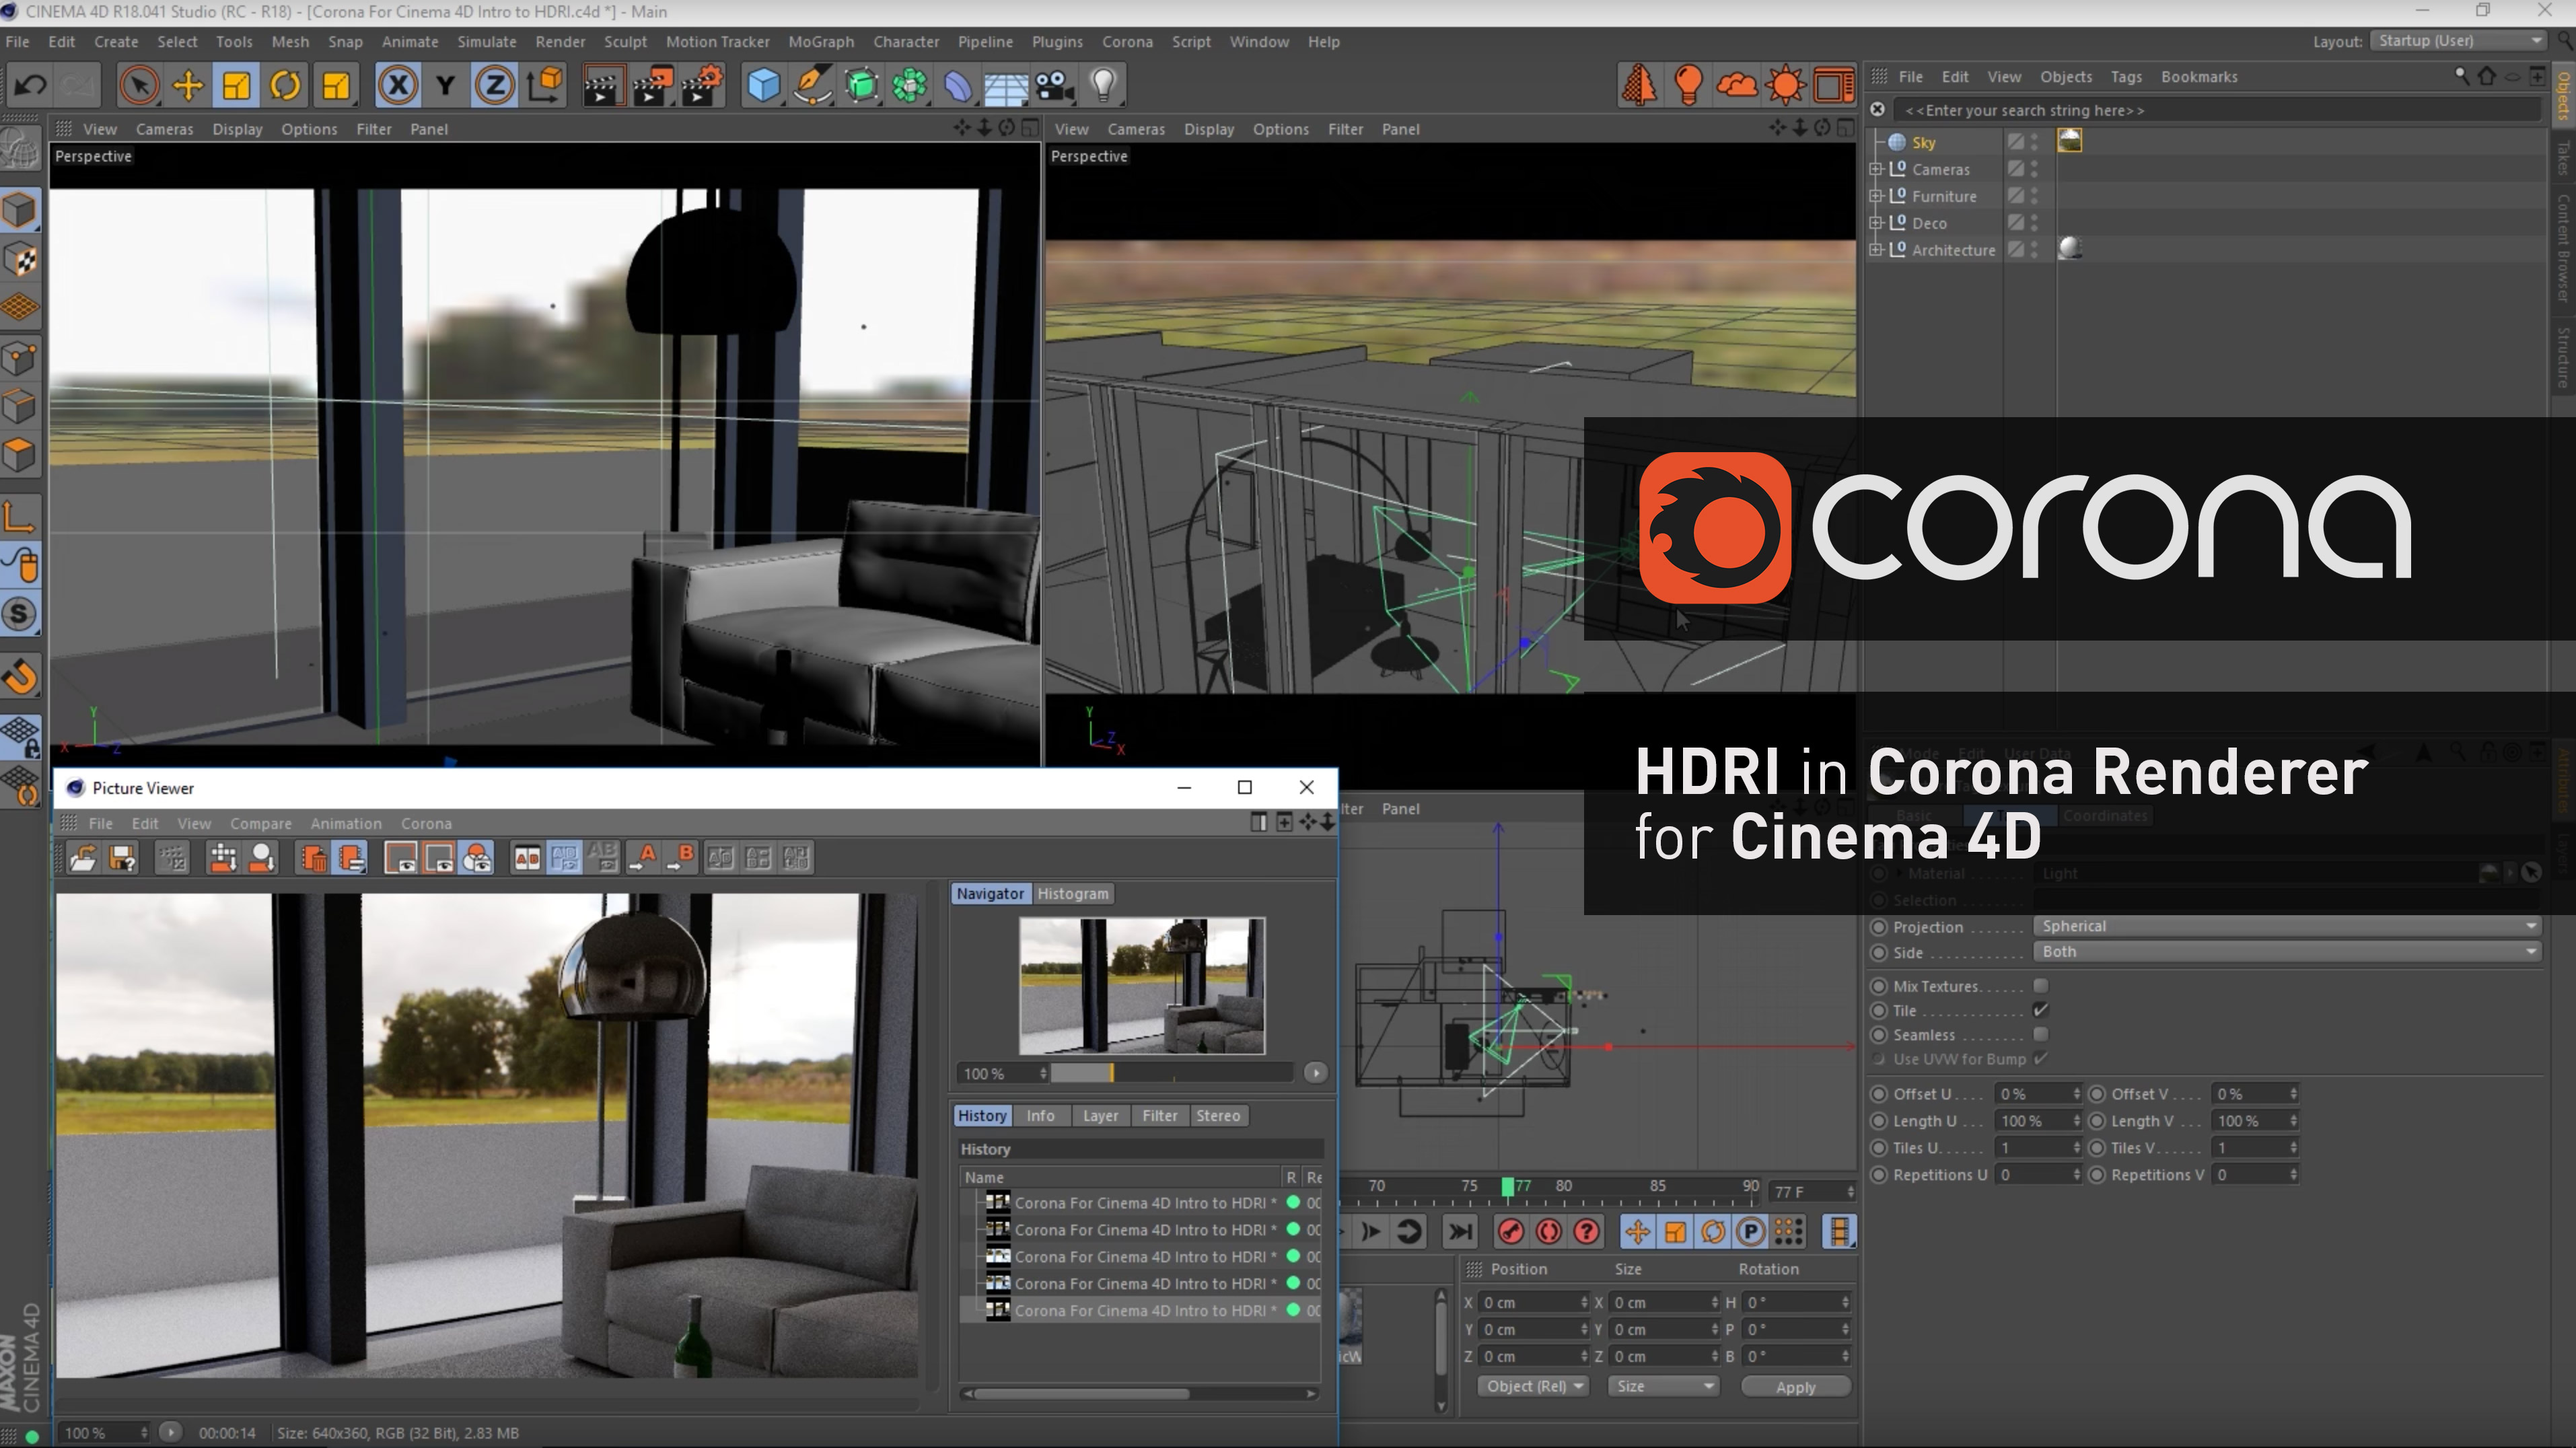 Hdri in corona renderer per cinema 4d 3dart for Cinema 4d raumgestaltung